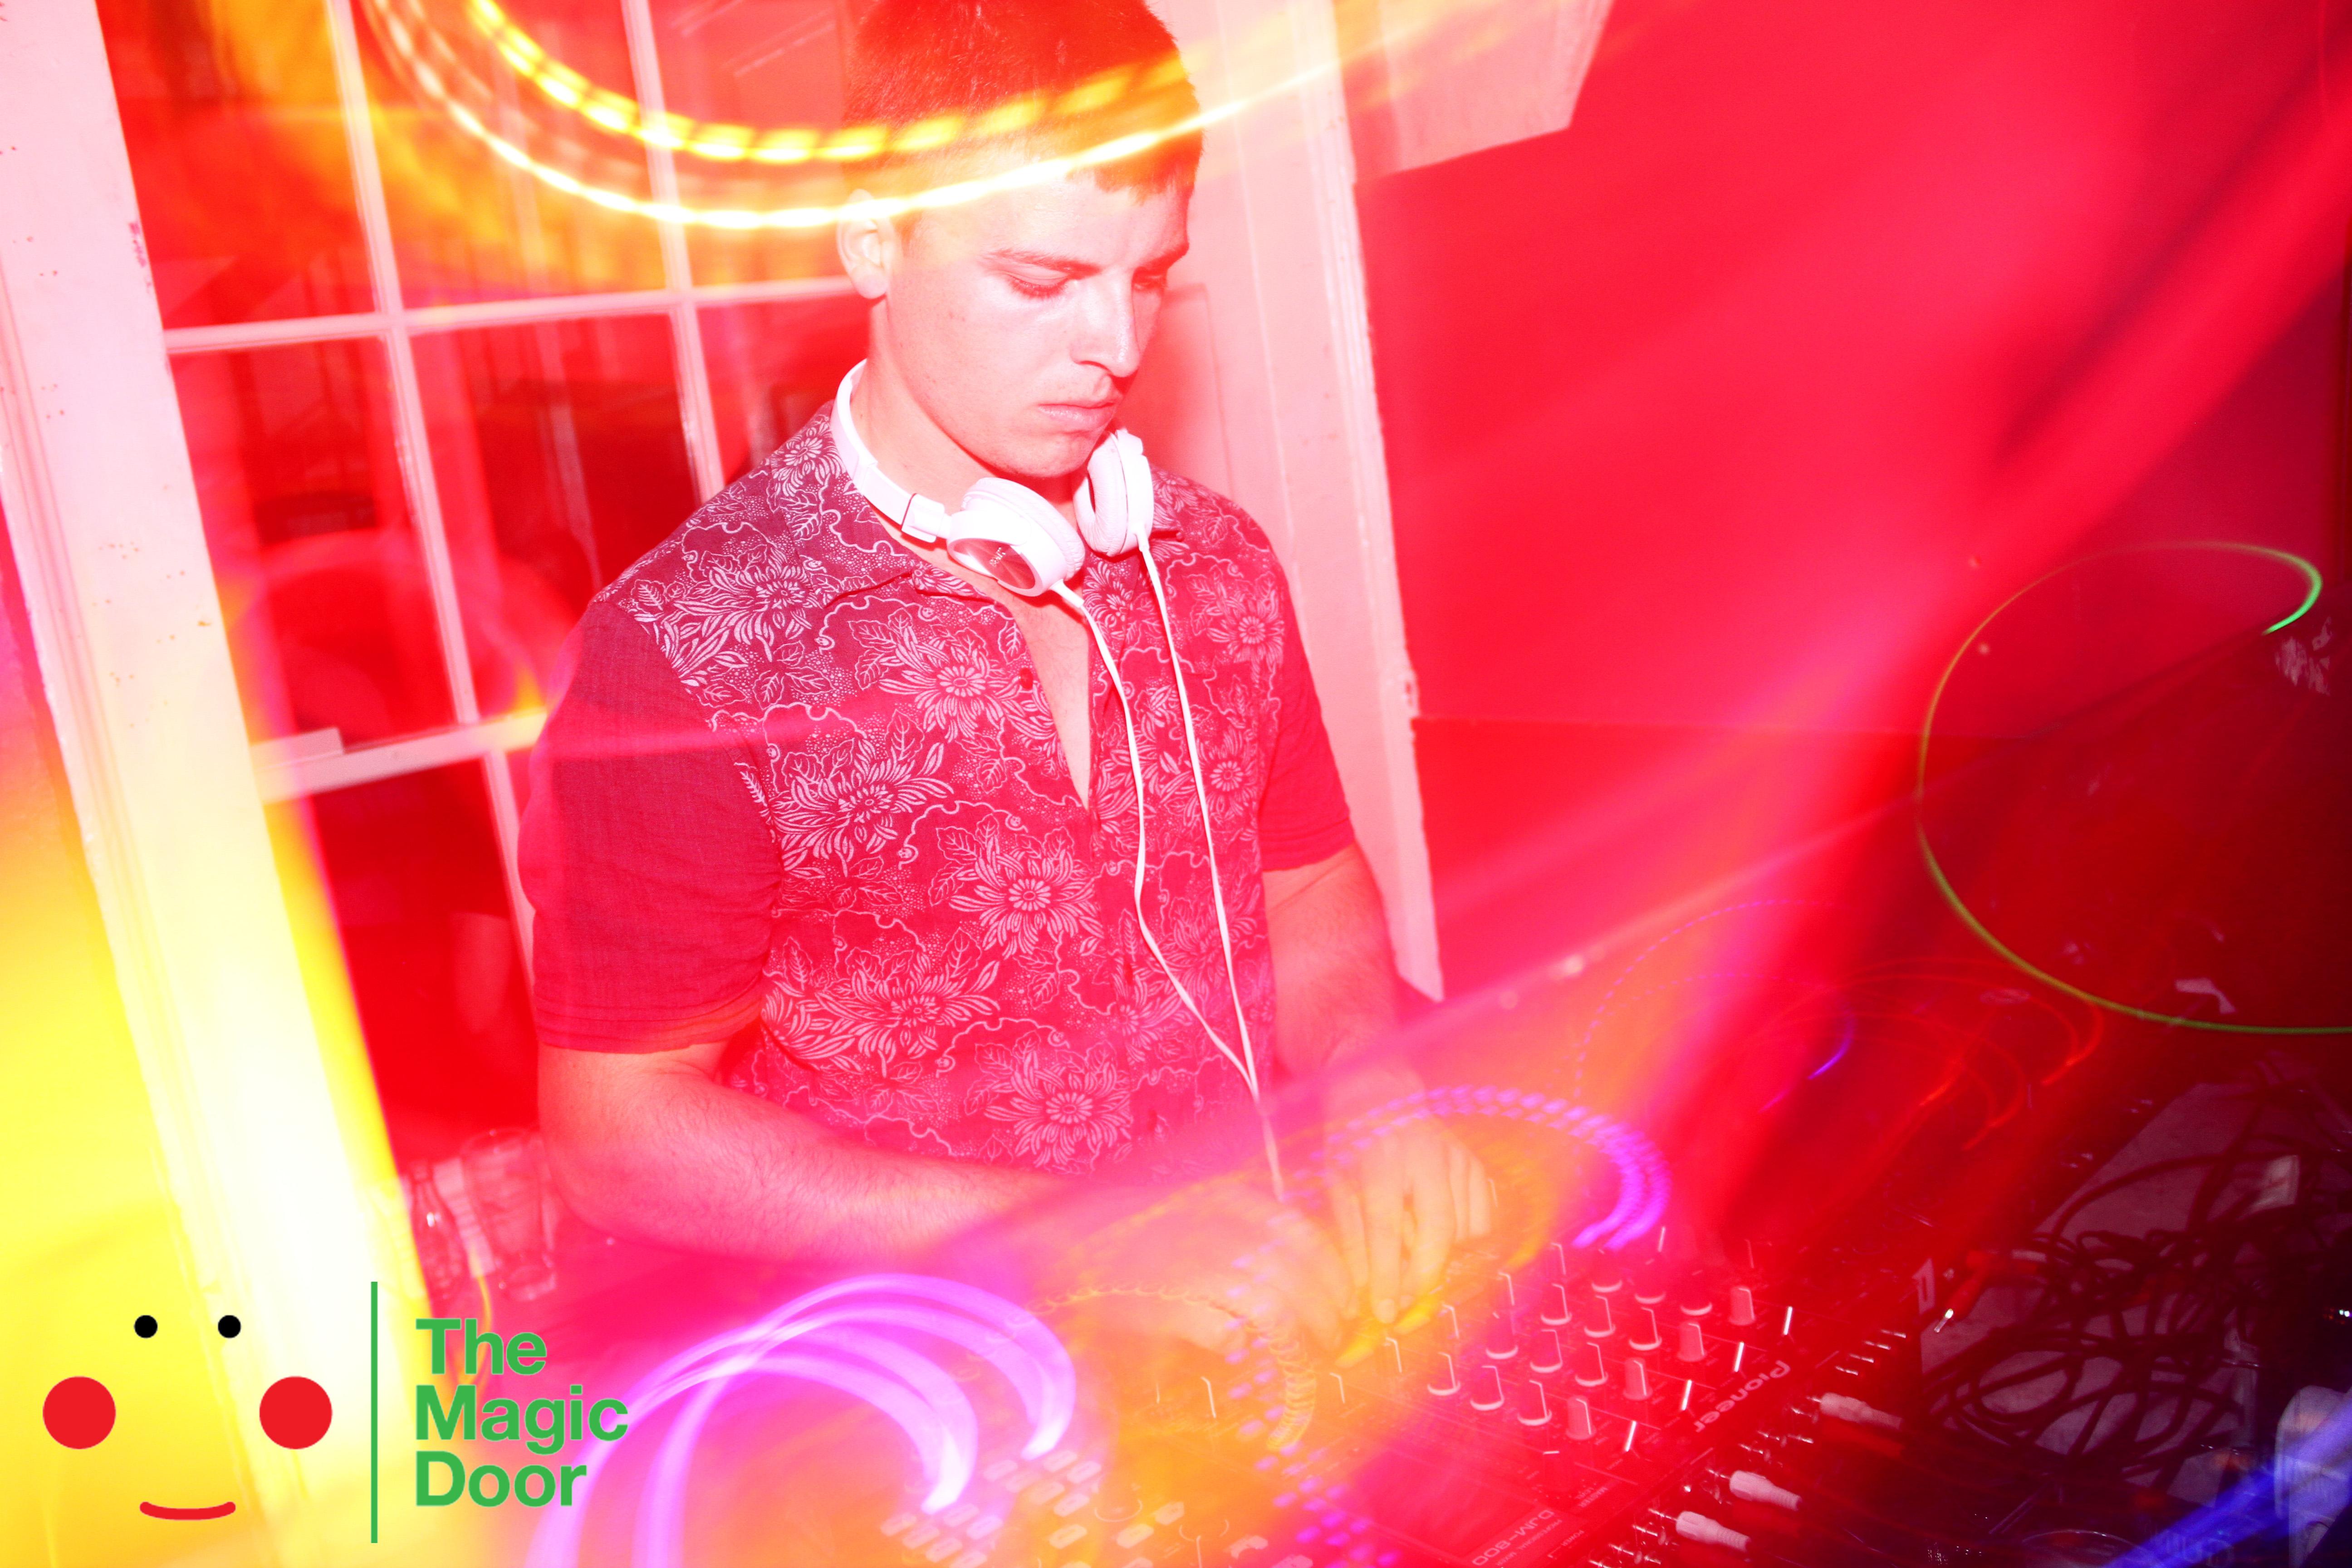 The Magic Door DJ at The Lost Society